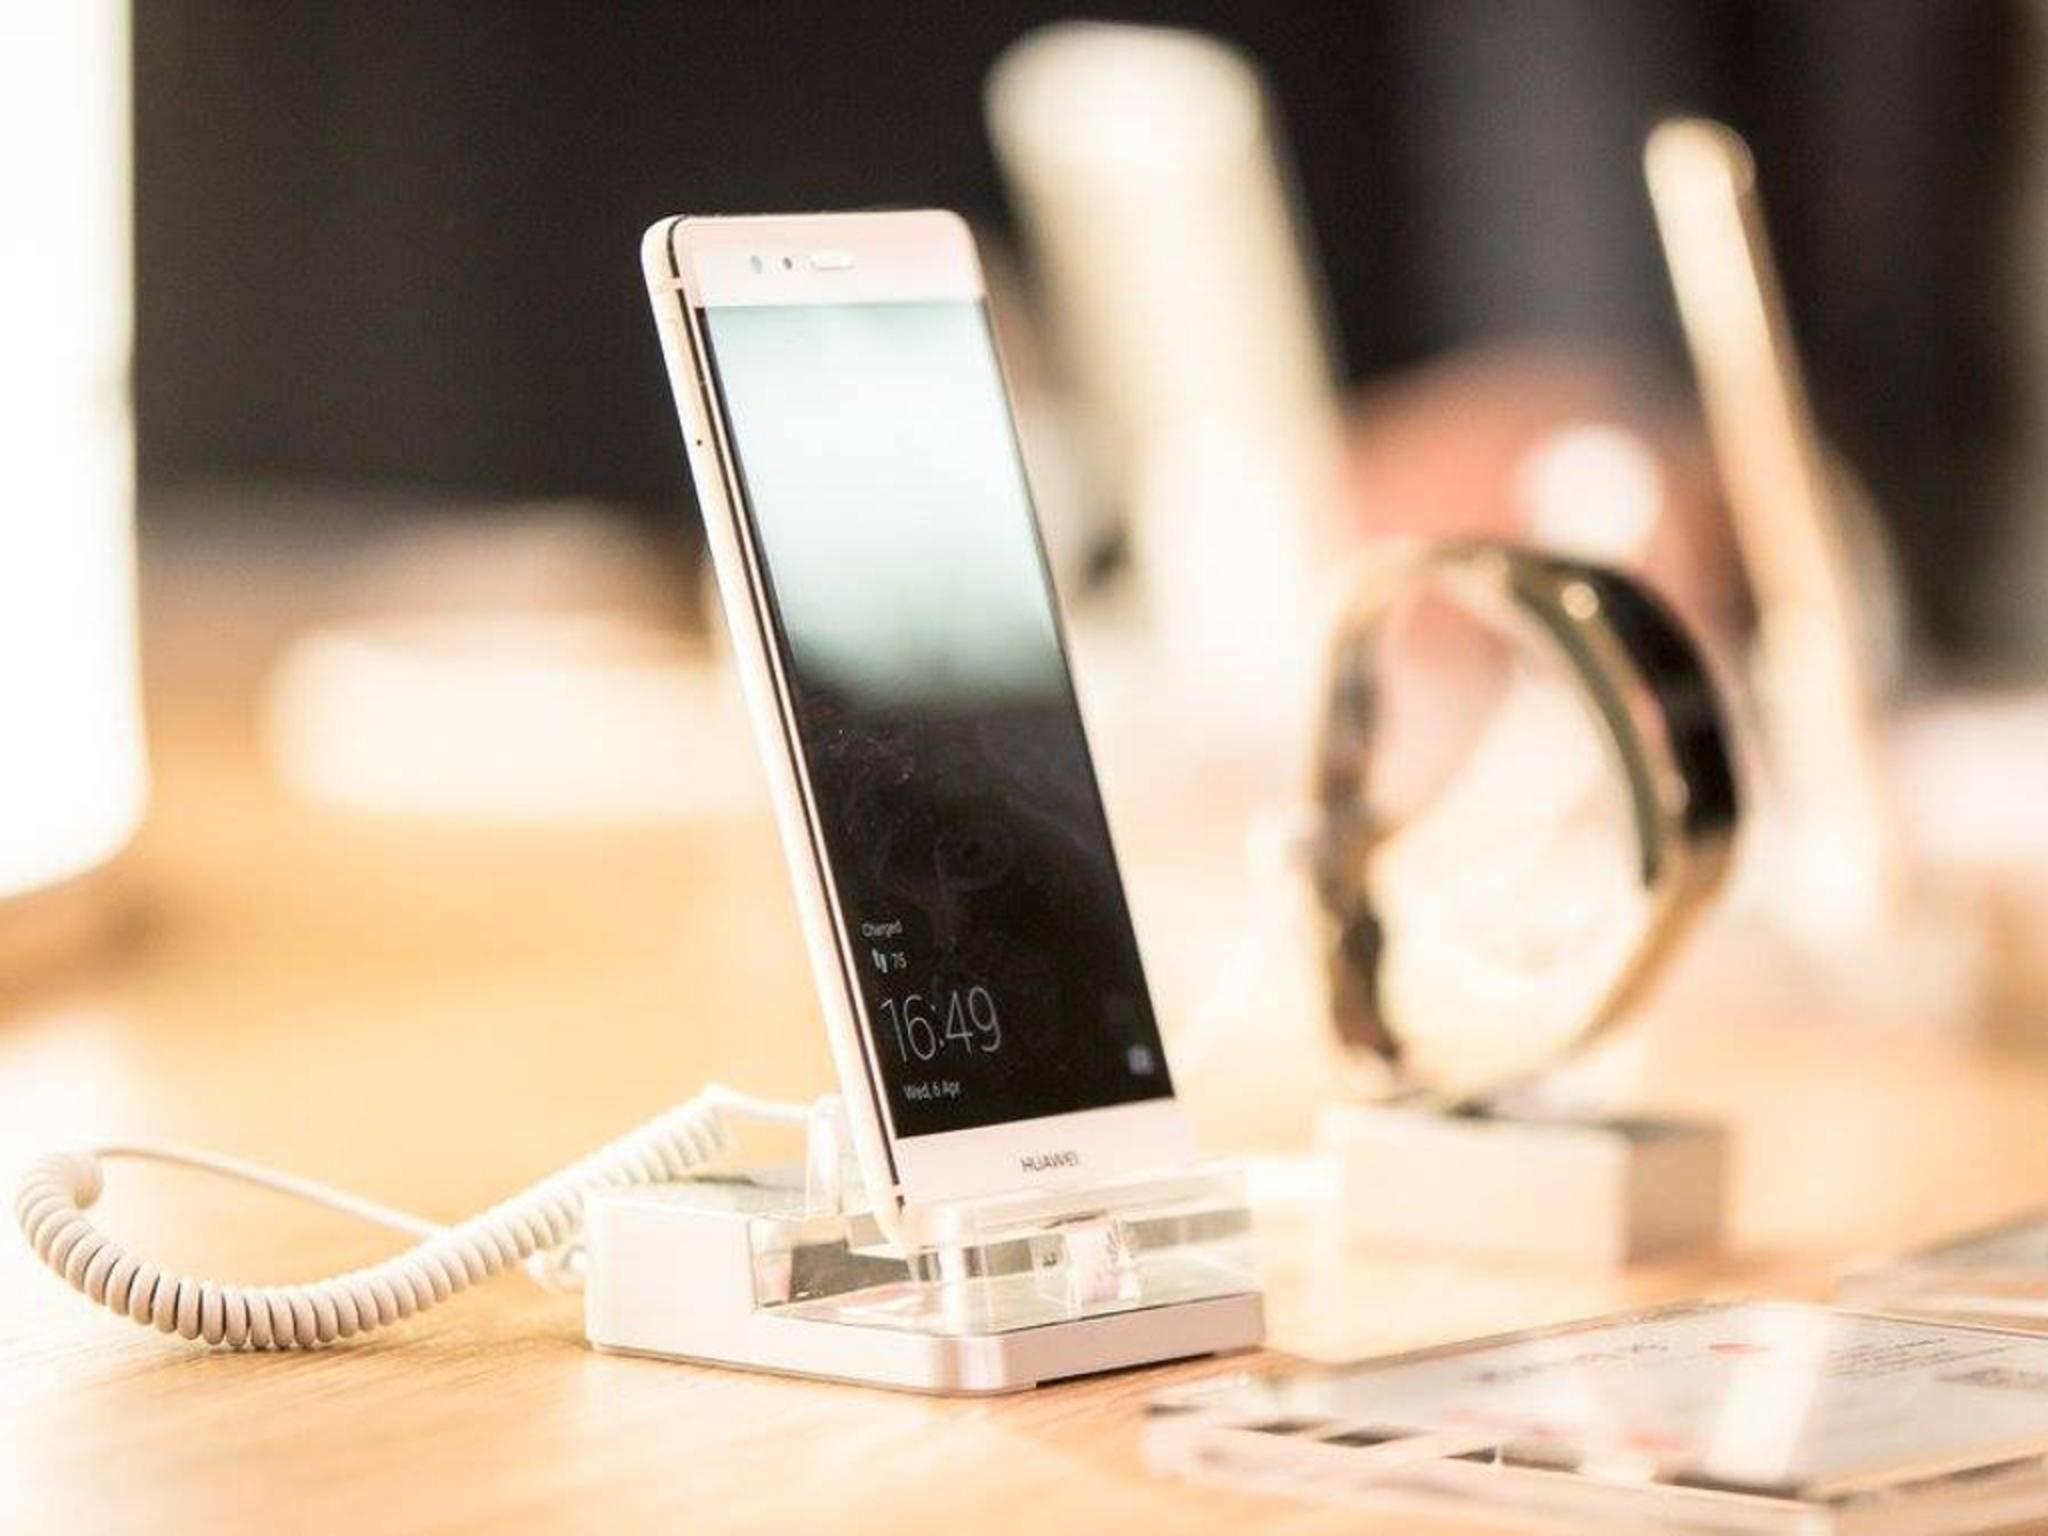 Das Huawei P9 bekommt noch ein paar Ableger spendiert.